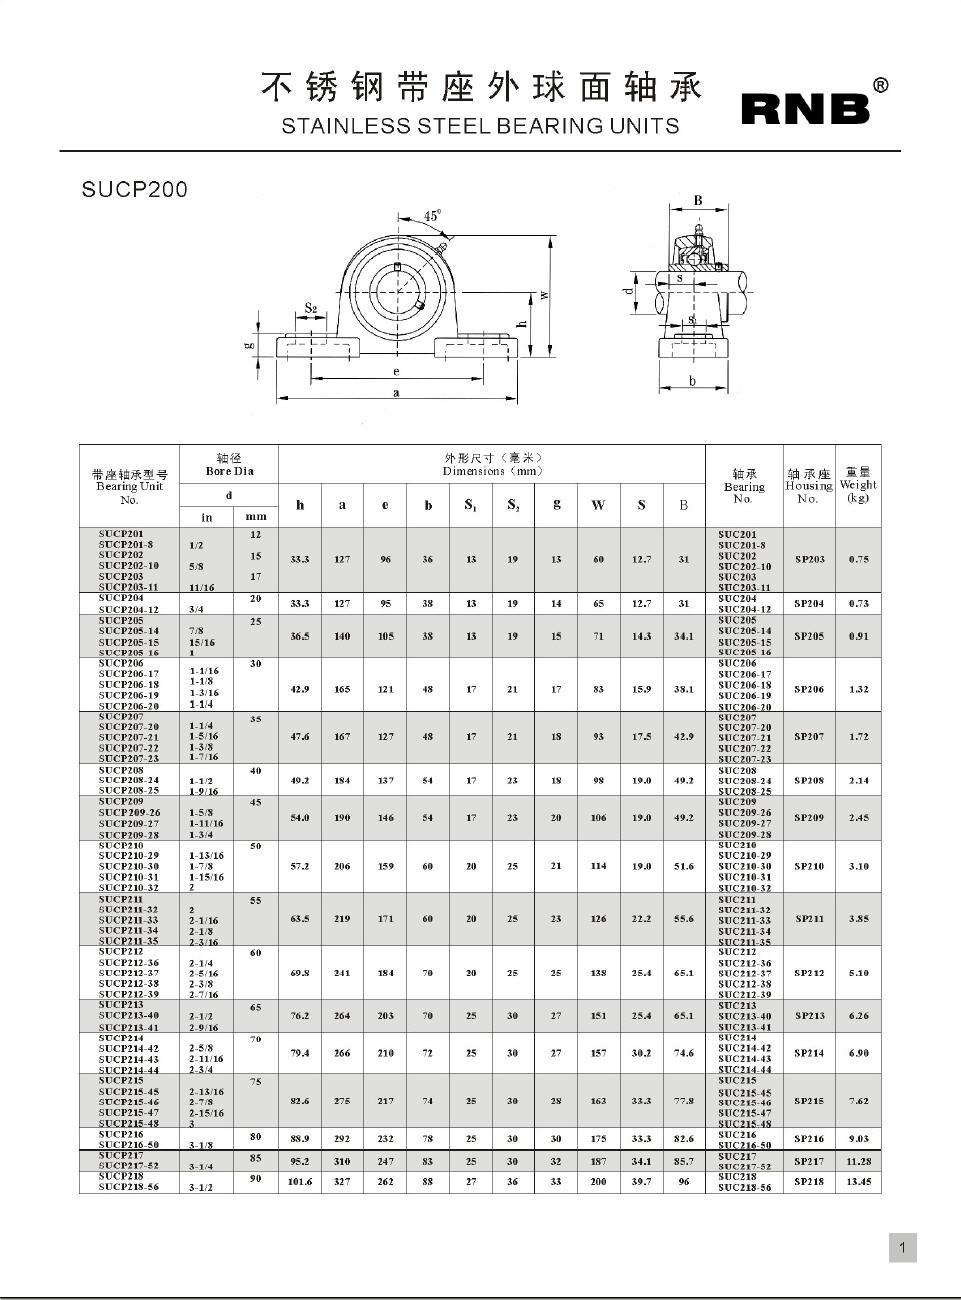 SUCP201 | SUCP201-8 | SUCP202 | SUCP202-10 | SUCP203 | SUCP203-11 | SUC201 | SUC201-8 | SUC202 | SUC202-10 | SUC203 | SUC203-11 | SUCP204 | SUCP204-12 | SUC204 | SUC204-12 | SUCP205 | SUCP205-14 | SUCP205-15 | SUCP205-16 | SUC205 | SUC205-14 | SUC205-15 | SUC205-16 | SUCP206 | SUCP206-17 | SUCP206-18 | SUCP206-19 | SUCP206-20 | SUC206 | SUC206-17 | SUC206-18 | SUC206-19 | SUC206-20 | SUCP207 | SUCP207-20 | SUCP207-21 | SUCP207-22 | SUCP207-23 | SUC207 | SUC207-20 | SUC207-21 | SUC207-22 | SUC207-23 | SUCP208 | SUCP208-24 | SUCP208-25 | SUC208 | SUC208-24 | SUC208-25 | SUCP209 | SUCP209-26 | SUCP209-27 | SUCP209-28 | SUC209 | SUC209-26 | SUC209-27 | SUC209-28 | SUCP210 | SUCP210-29 | SUCP210-30 | SUCP210-31 | SUCP210-32 | SUC210 | SUC210-29 | SUC210-30 | SUC210-31 | SUC210-32 | SUCP211 | SUCP211-32 | SUCP211-33 | SUCP211-34 | SUCP211-35 | SUC211 | SUC211-32 | SUC211-33 | SUC211-34 | SUC211-35 | SUCP212 | SUCP212-36 | SUCP212-37 | SUCP212-38 | SUCP212-39 | SUC212 | SUC212-36 | SUC212-37 | SUC212-38 | SUC212-39 | SUCP213 | SUCP213-40 | SUCP213-41 | SUC213 | SUC213-40 | SUC213-41 | SUCP214 | SUCP214-42 | SUCP214-43 | SUCP214-44 | SUC214 | SUC214-42 | SUC214-43 | SUC214-44 | SUCP215 | SUCP215-45 | SUCP215-46 | SUCP215-47 | SUCP215-48 | SUC215 | SUC215-45 | SUC215-46 | SUC215-47 | SUC215-48 | SUCP216 | SUCP216-50 | SUC216 | SUC216-50 | SUCP217 | SUCP217-52 | SUC217 | SUC217-52 | SUCP218 | SUCP218-56 | SUC218 | SUC218-56 |